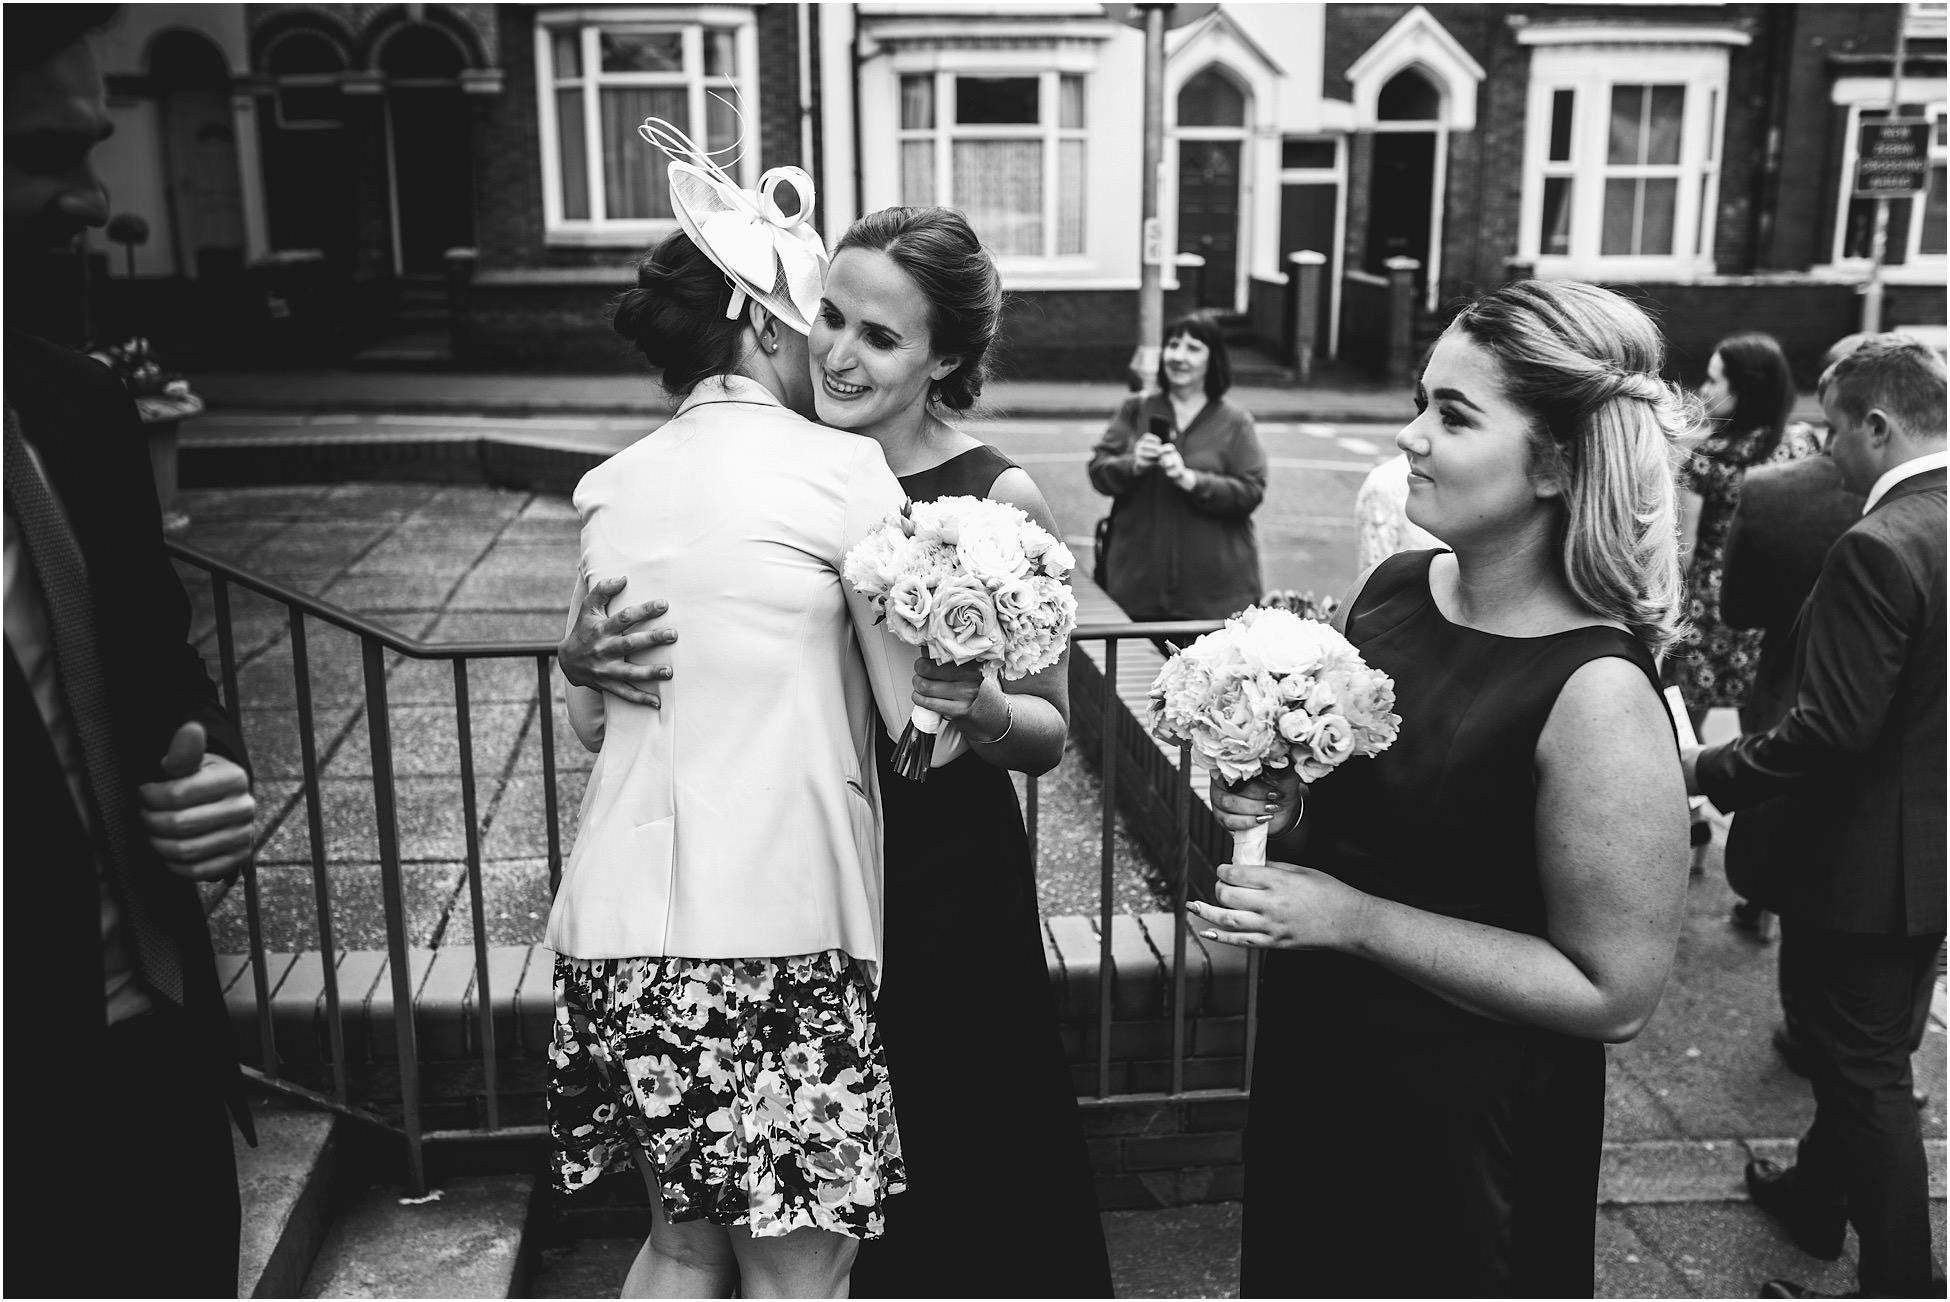 Bridesmaid hugging wedding guest outside church